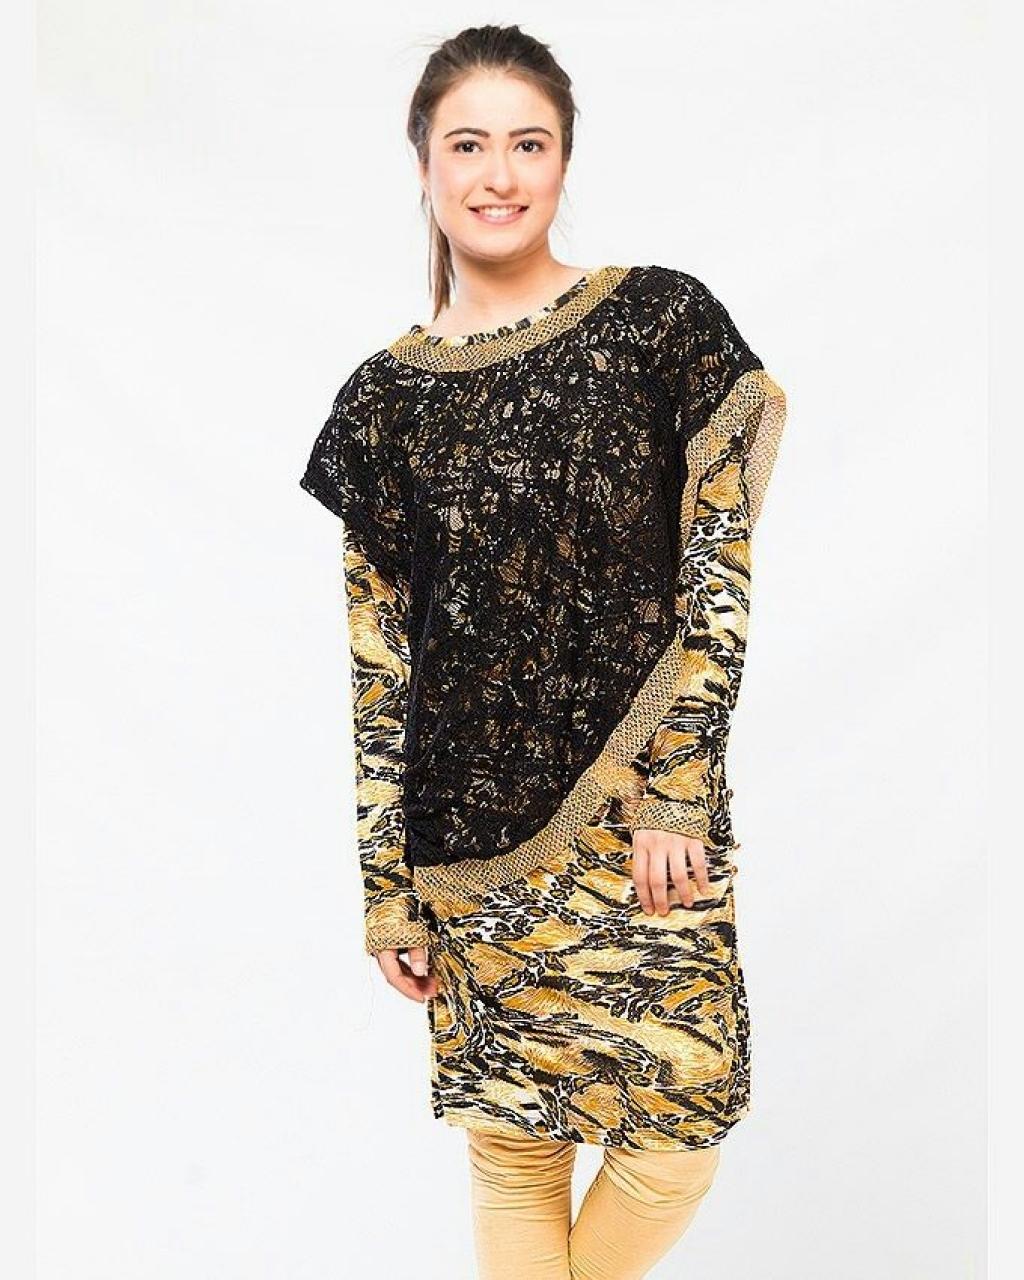 b91d0dce328bf Buy italian cheetah print top tights in pakistan jpg 1024x1280 Cheetah  print top